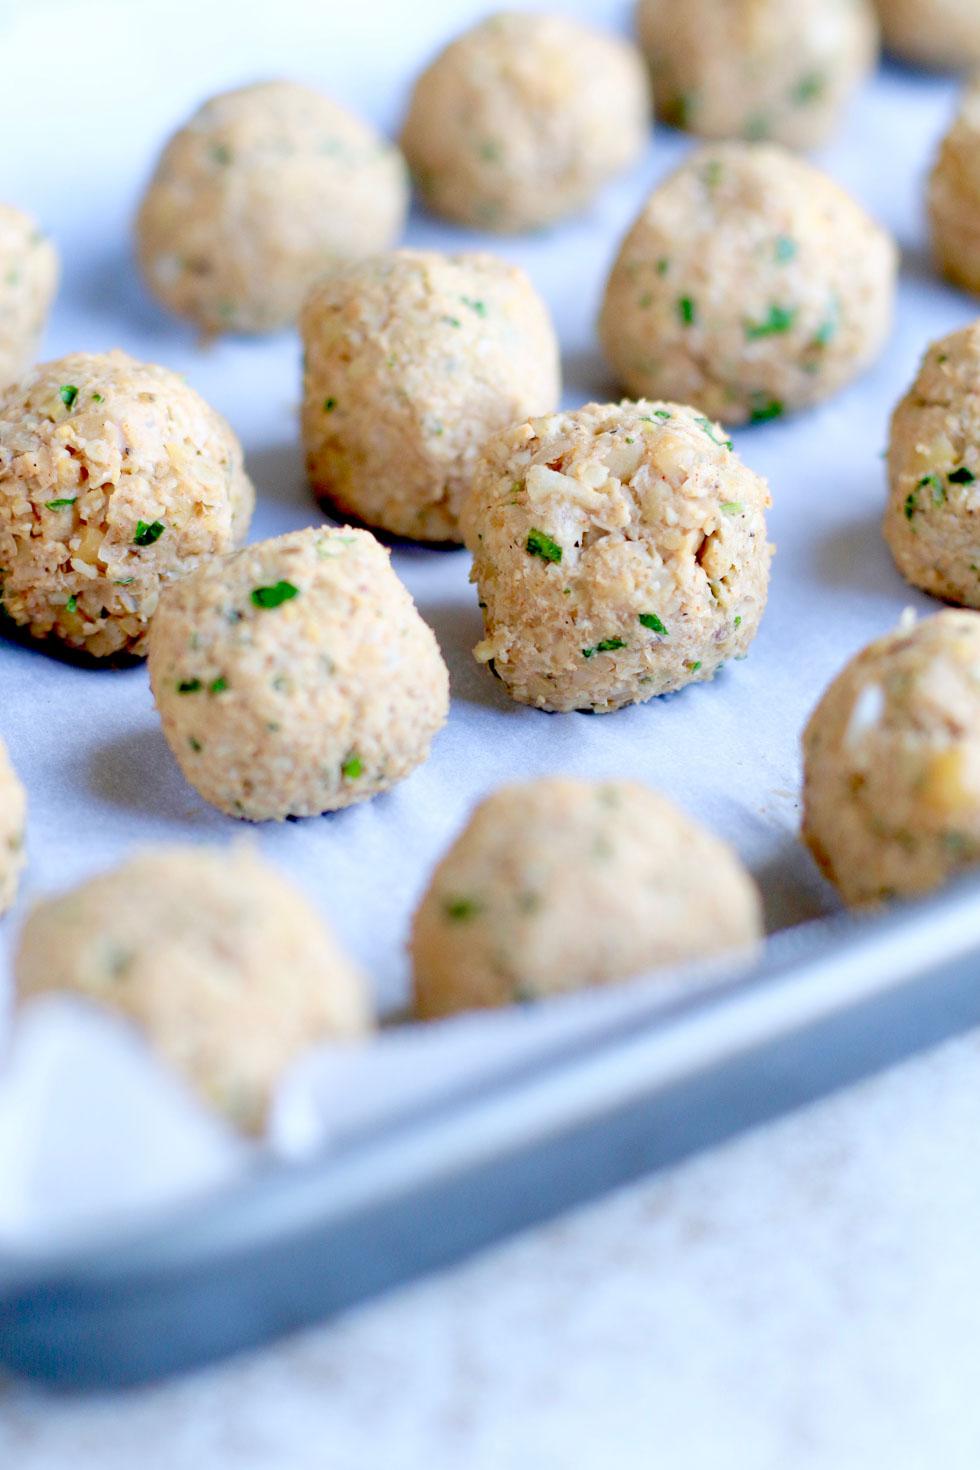 How to Make Vegetarian Meatballs